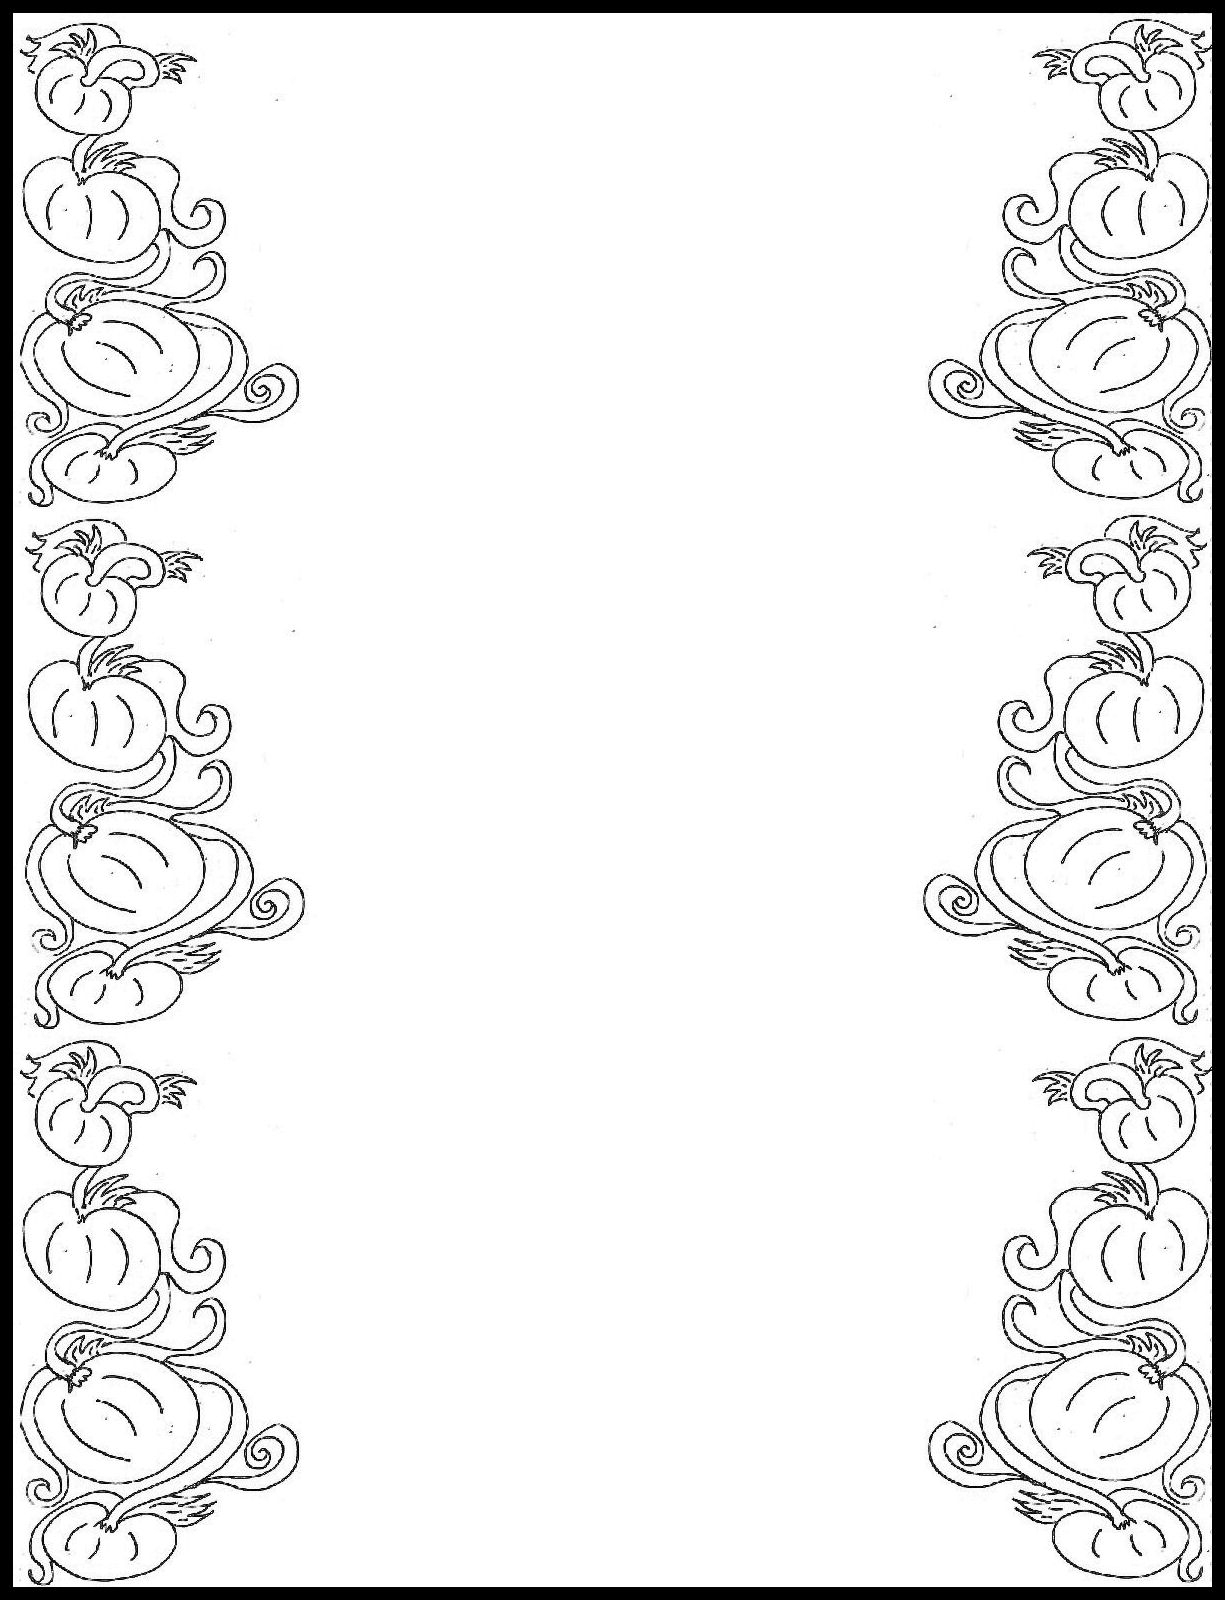 Free Free Printable Border Designs For Paper Black And White - Writing Borders Free Printable